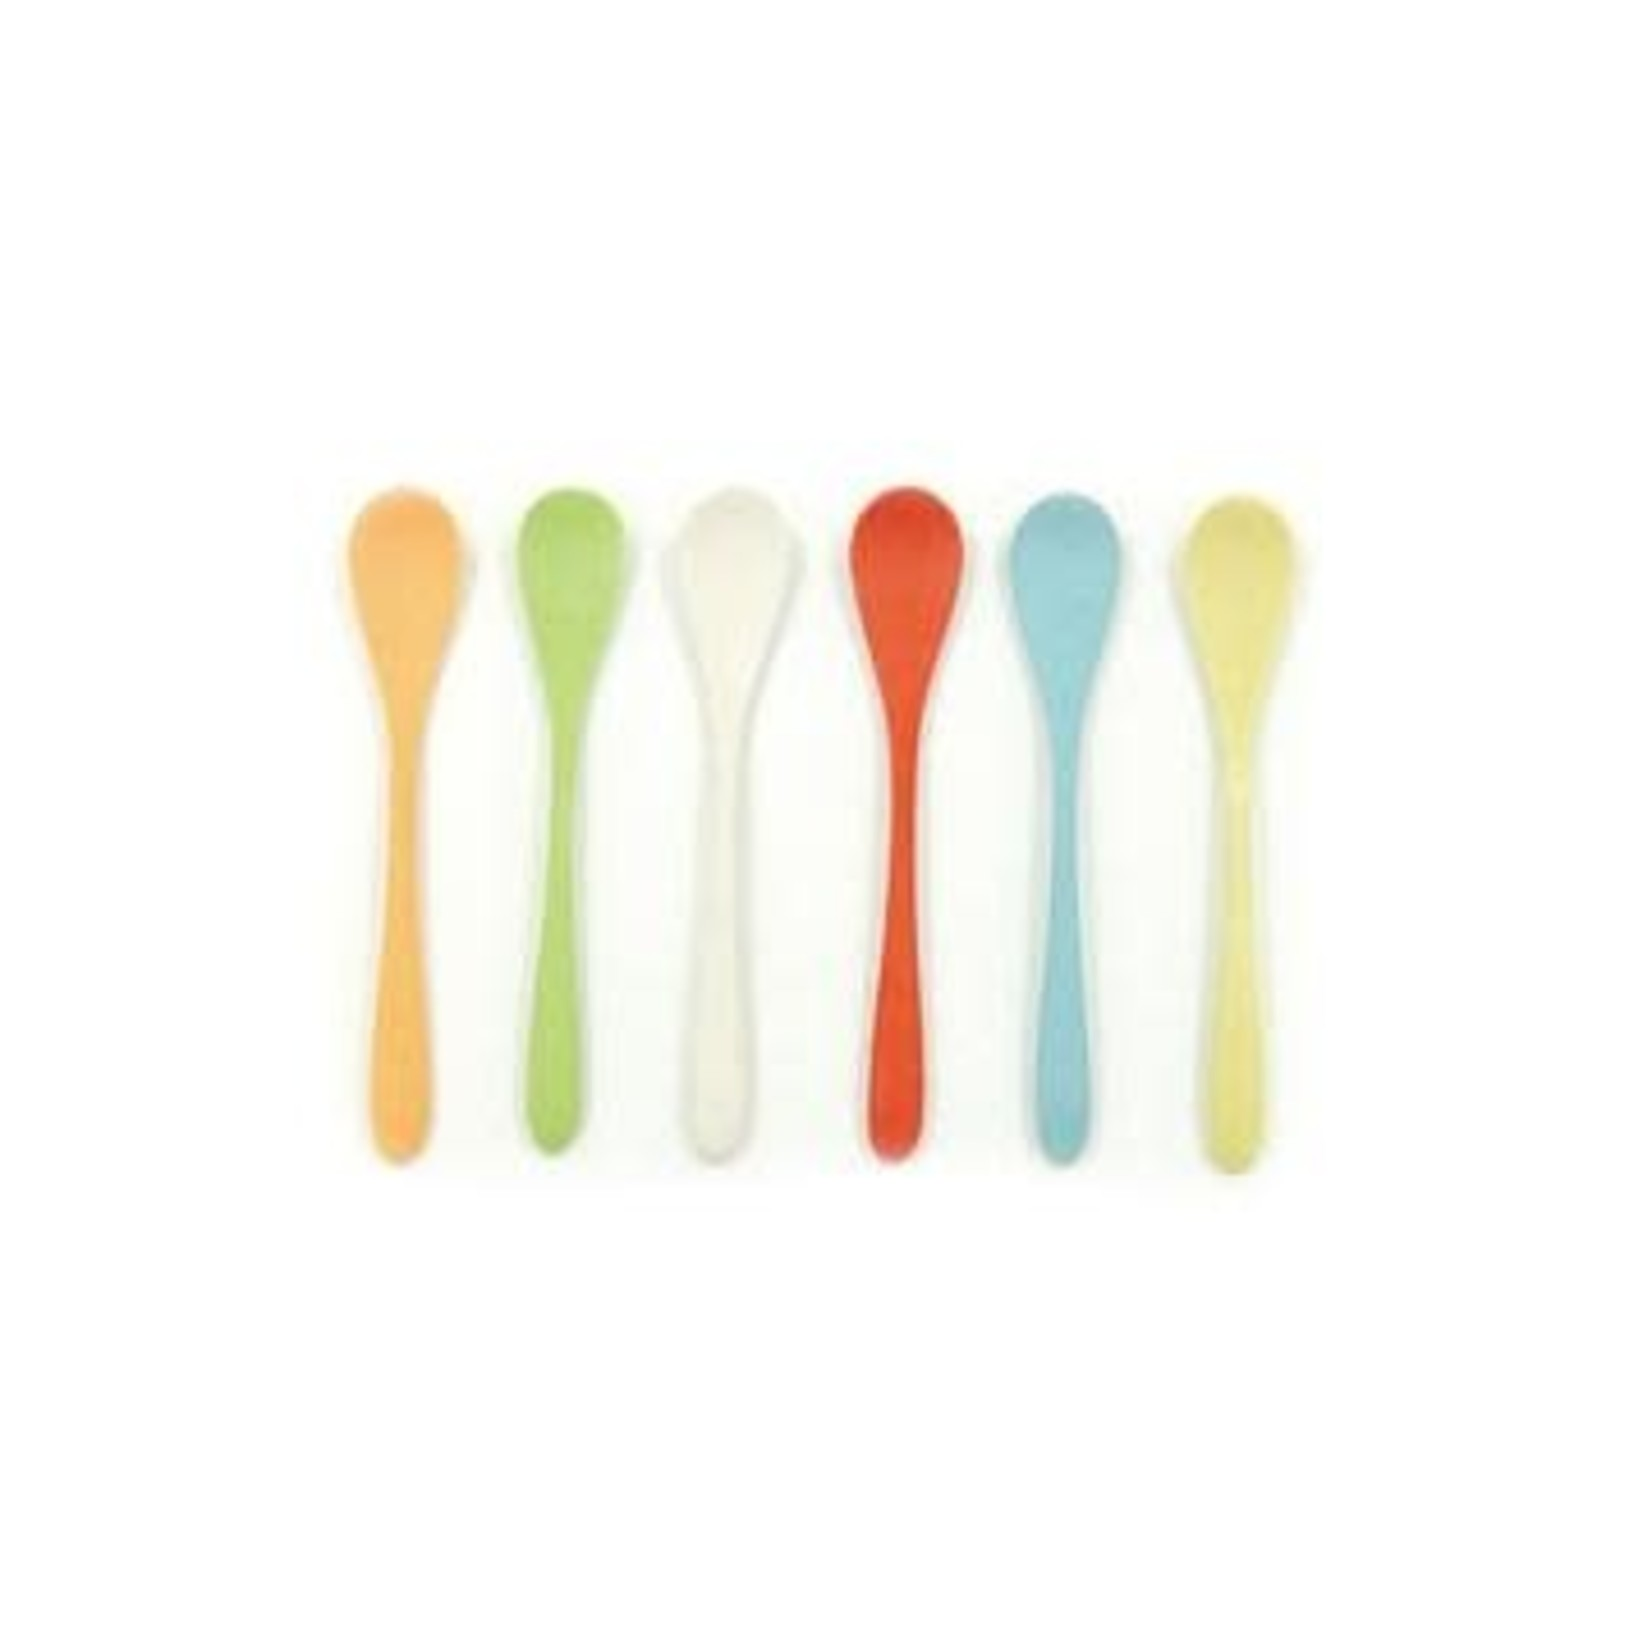 Petersons Housewares Mini Spoons